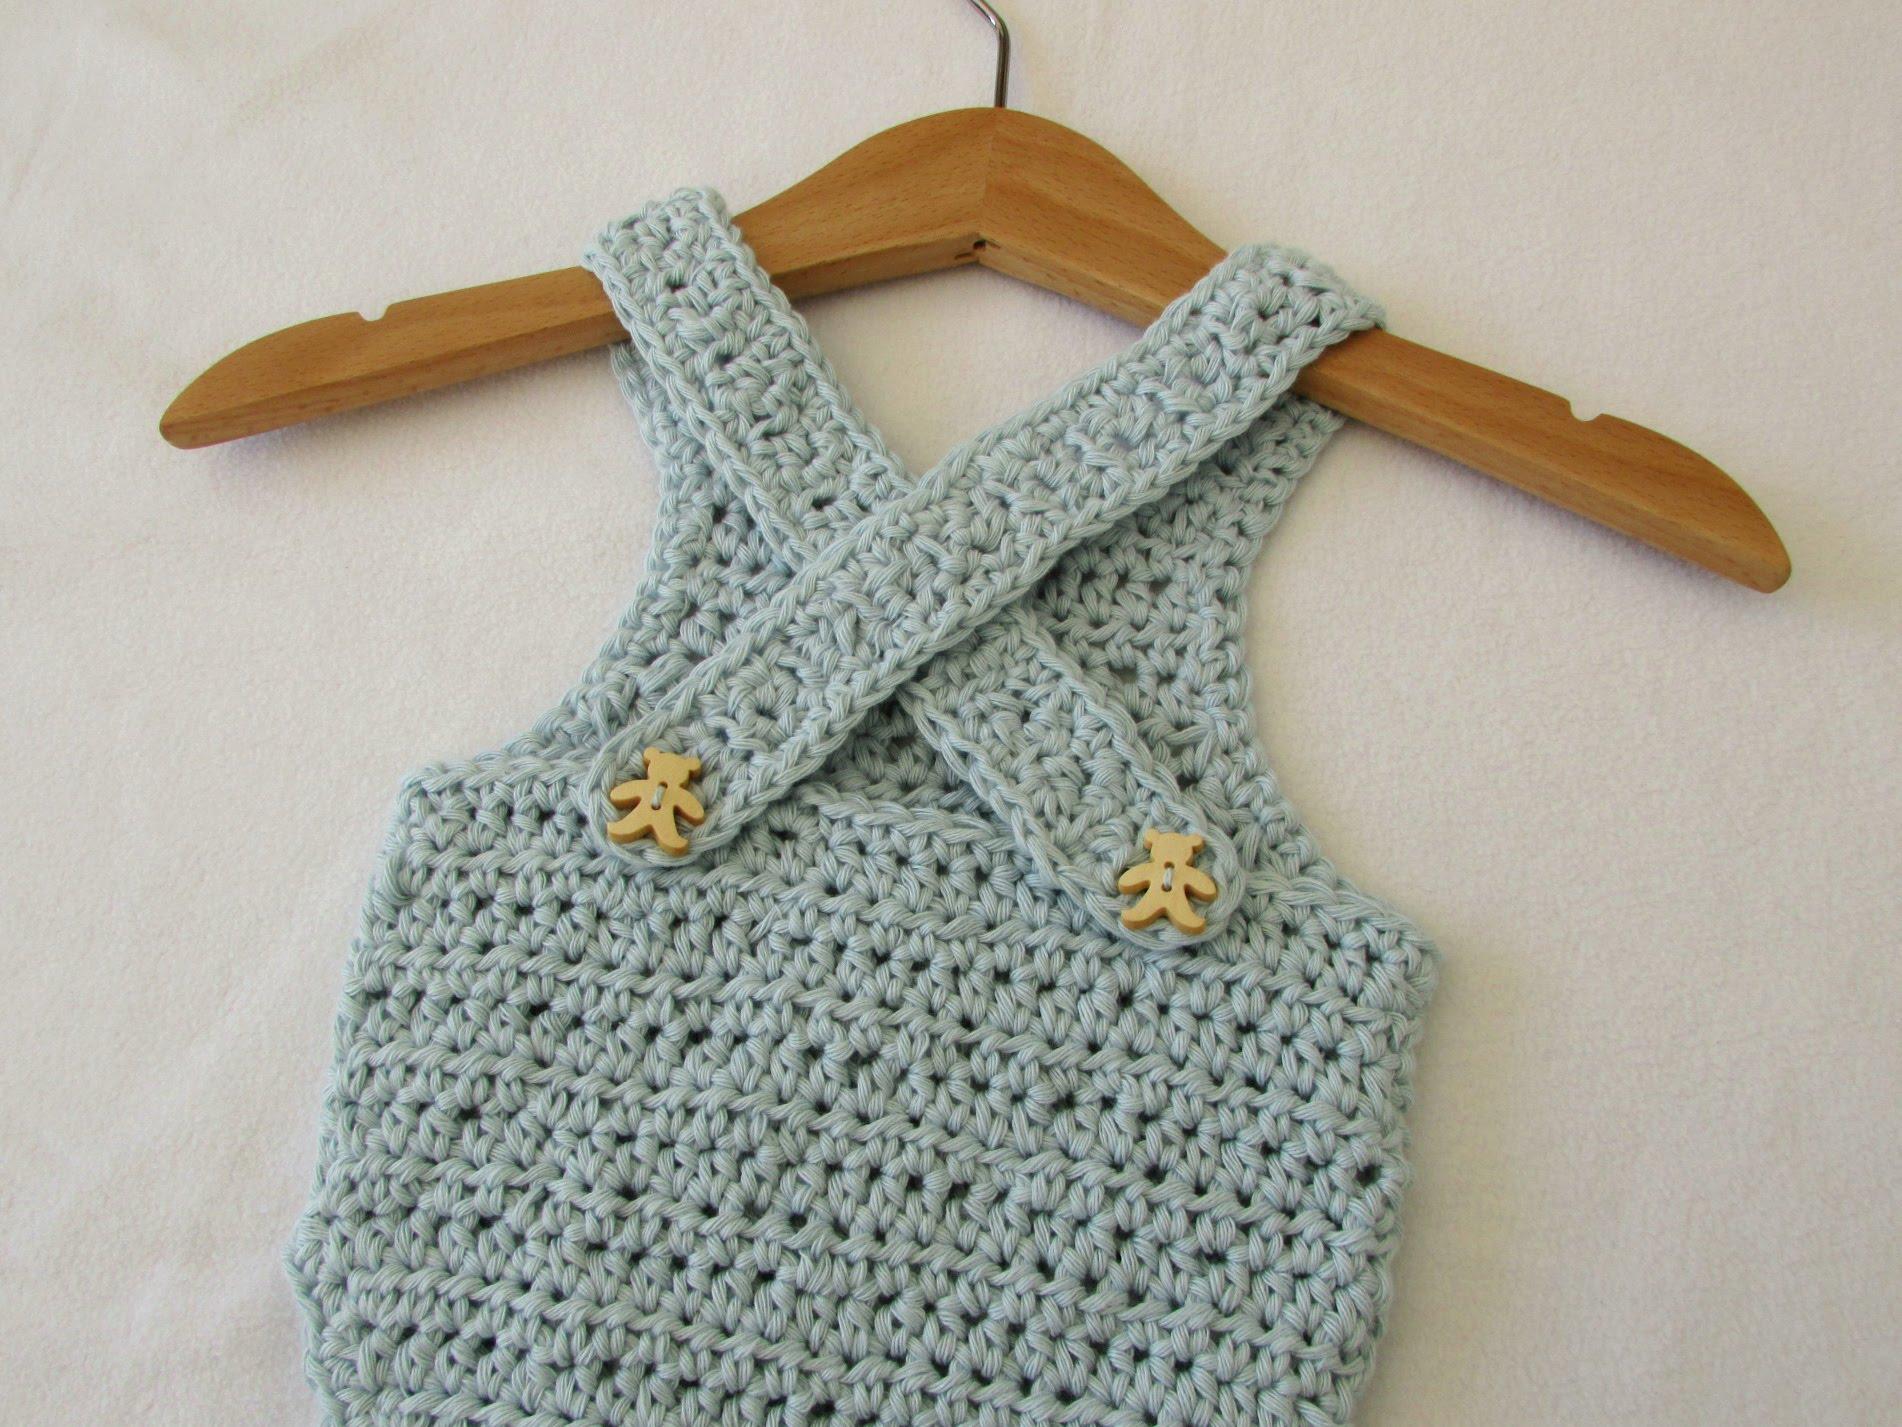 3 Cute Crochet Childrens Dress Patterns Crochet Ba Dresses Free Patterns Pinterest Dacc